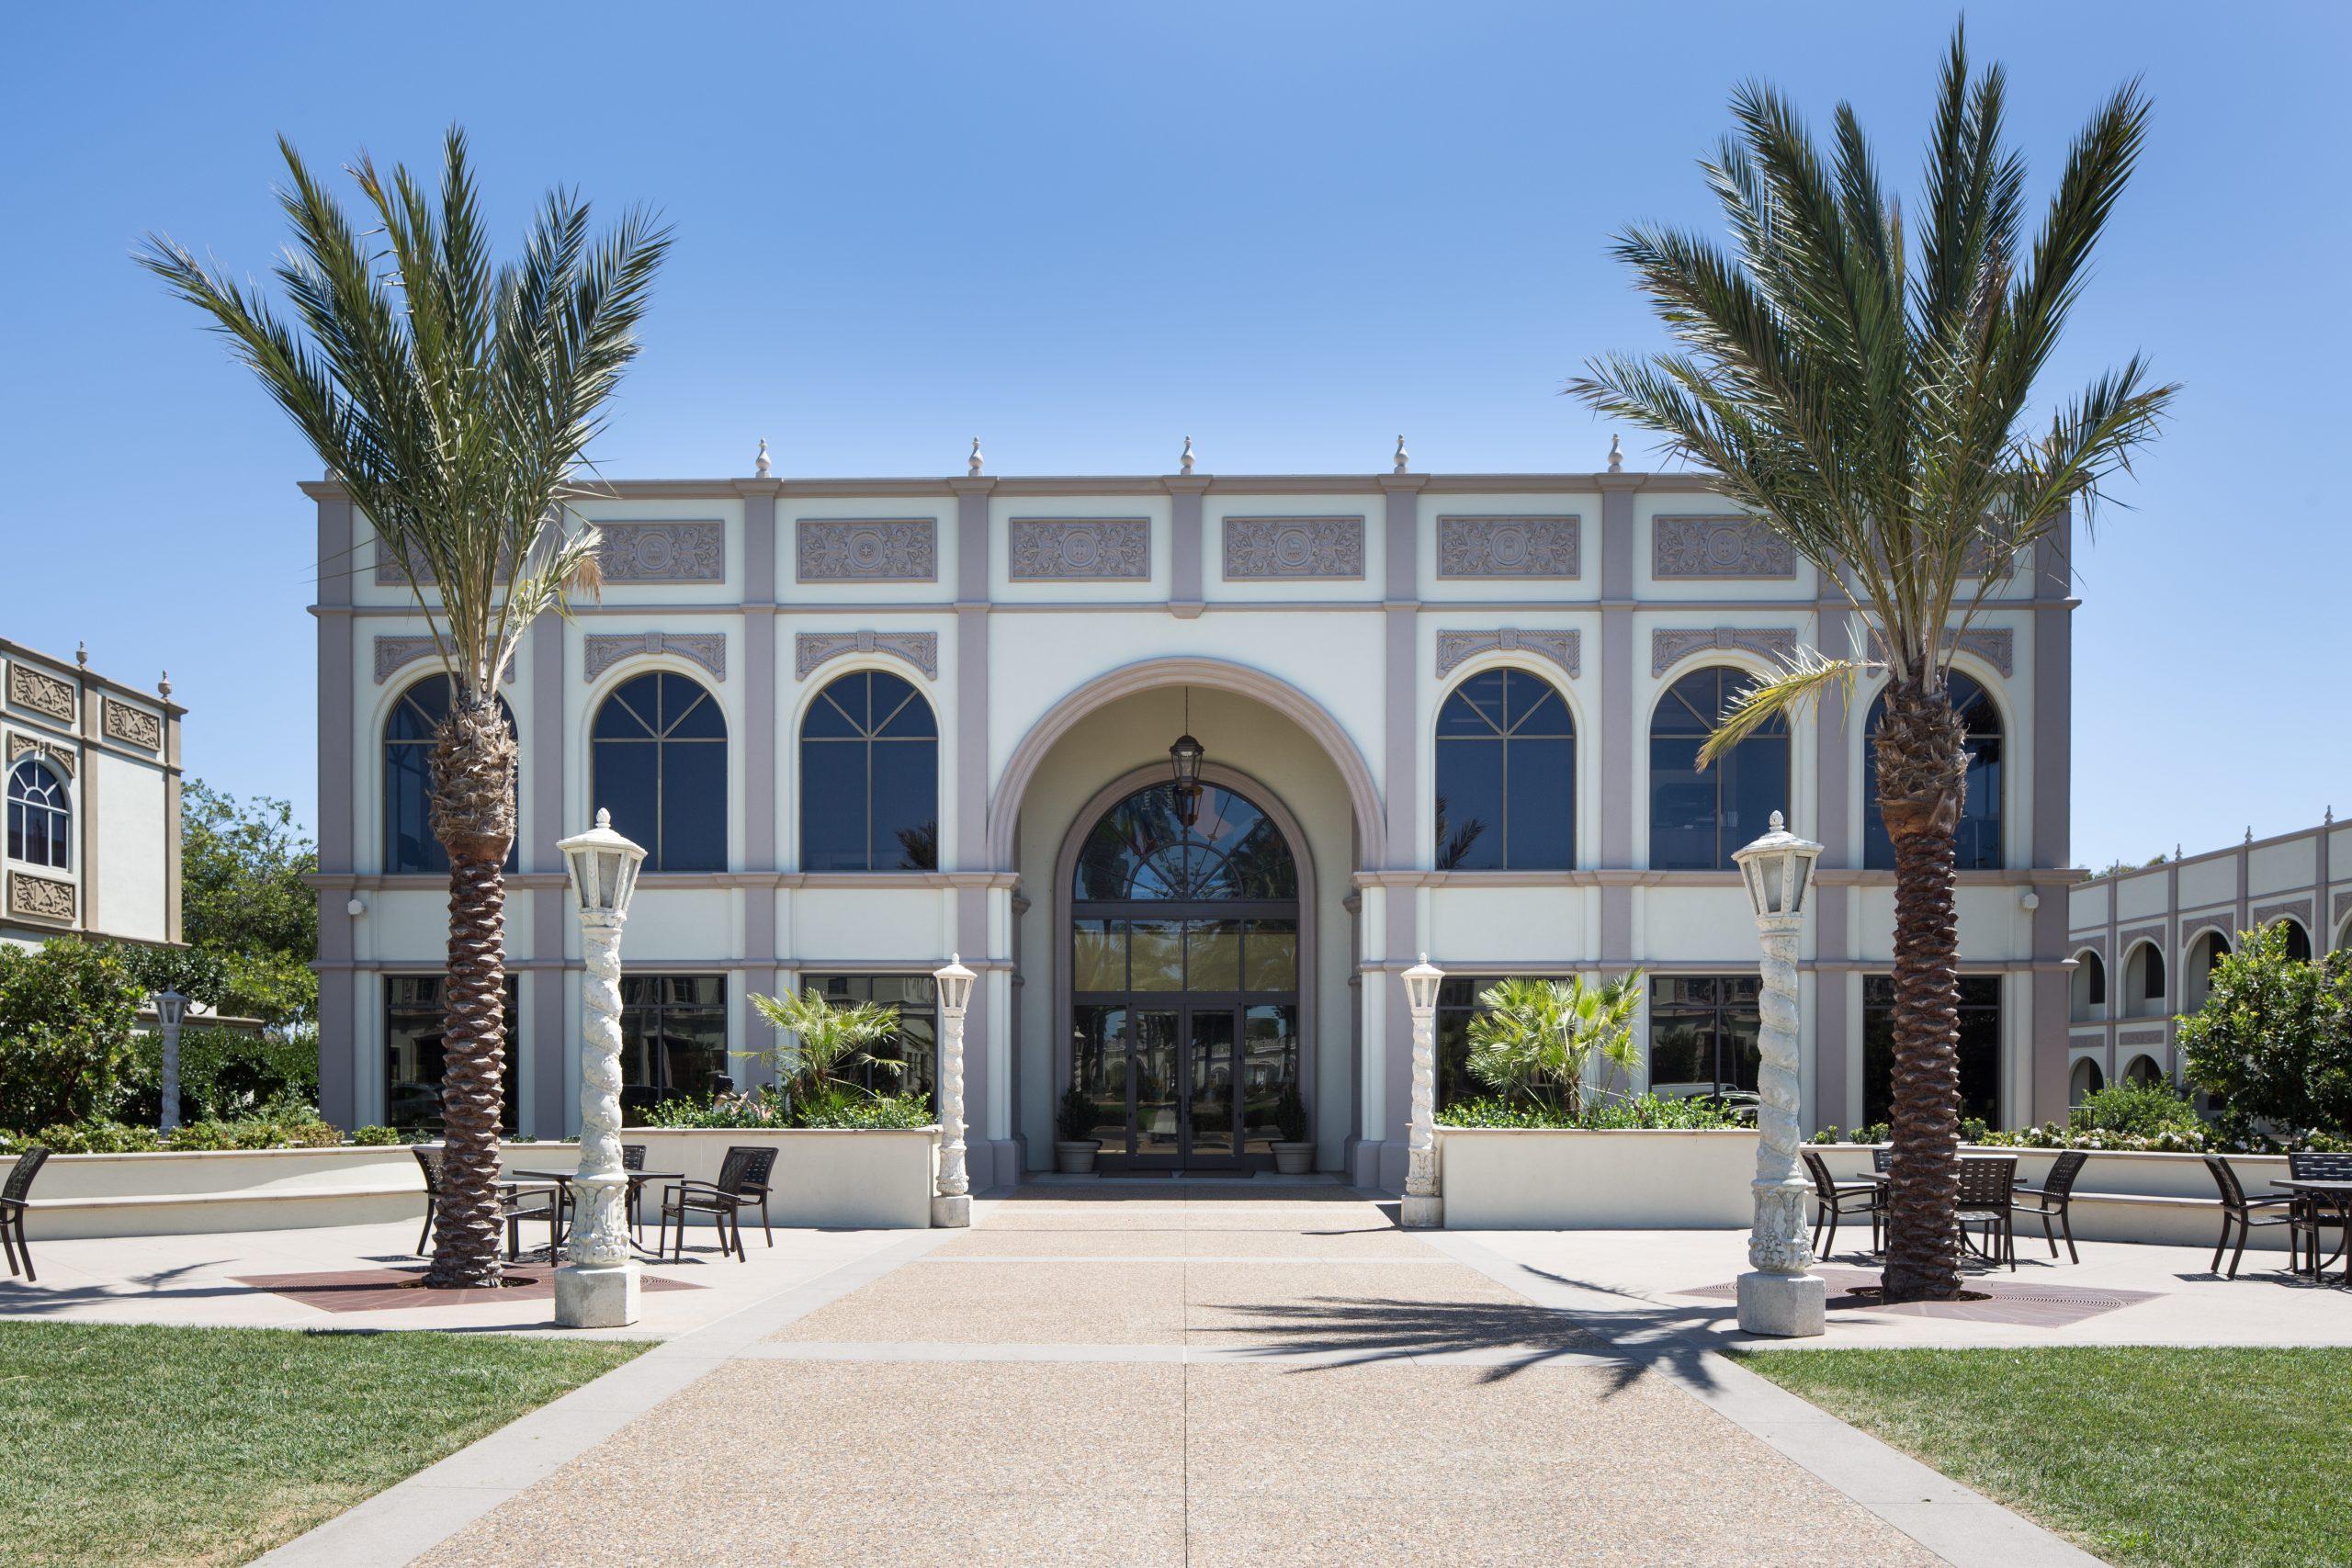 University of San Diego – Manchester Hall